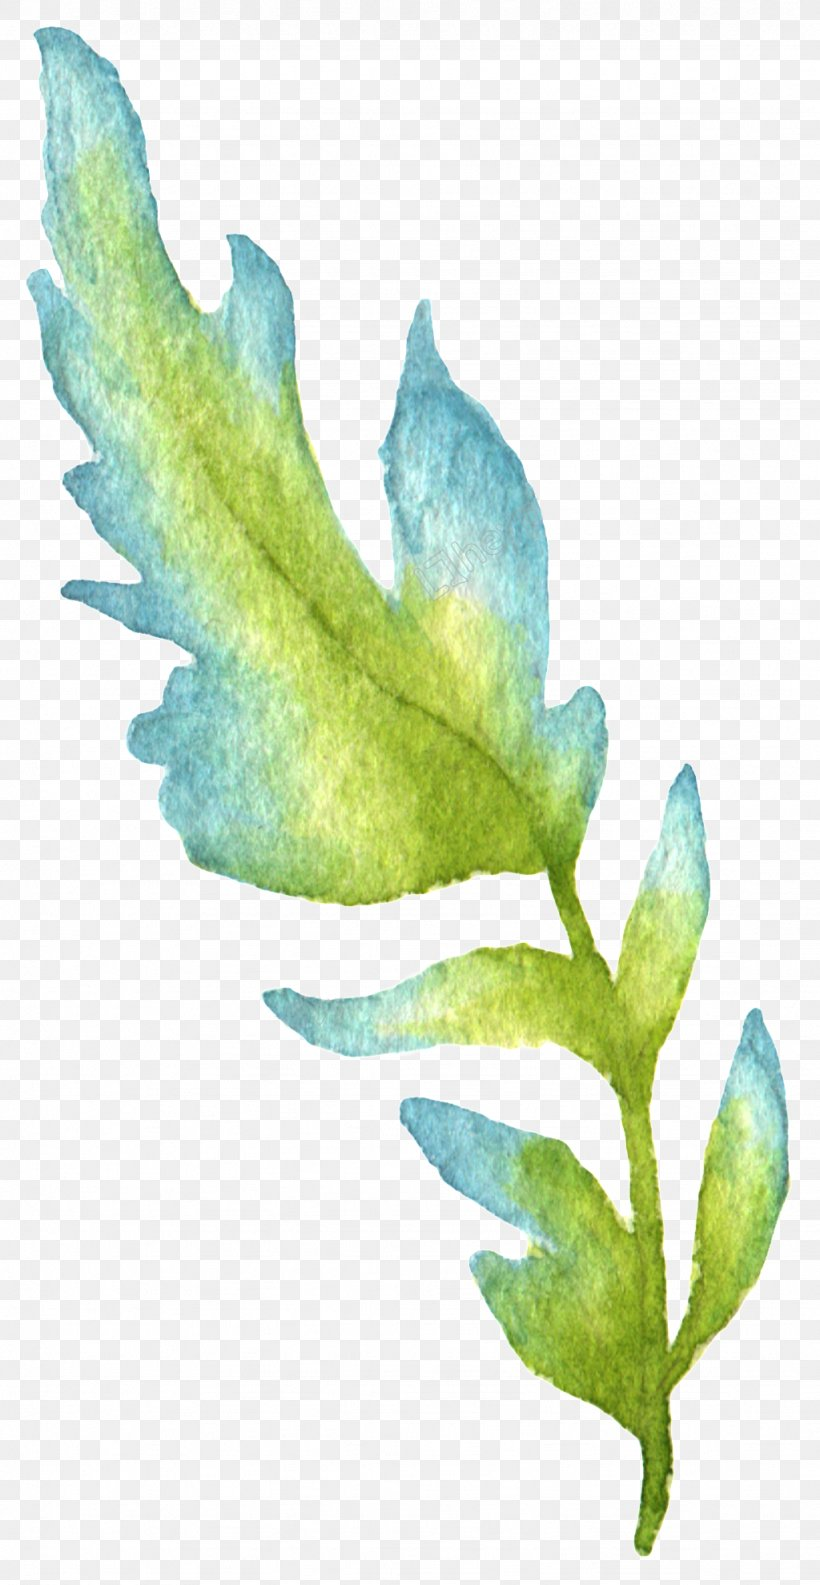 Leaf Watercolor Painting Green Image, PNG, 1024x1980px, Leaf, Aqua, Blue, Bluegreen, Botany Download Free